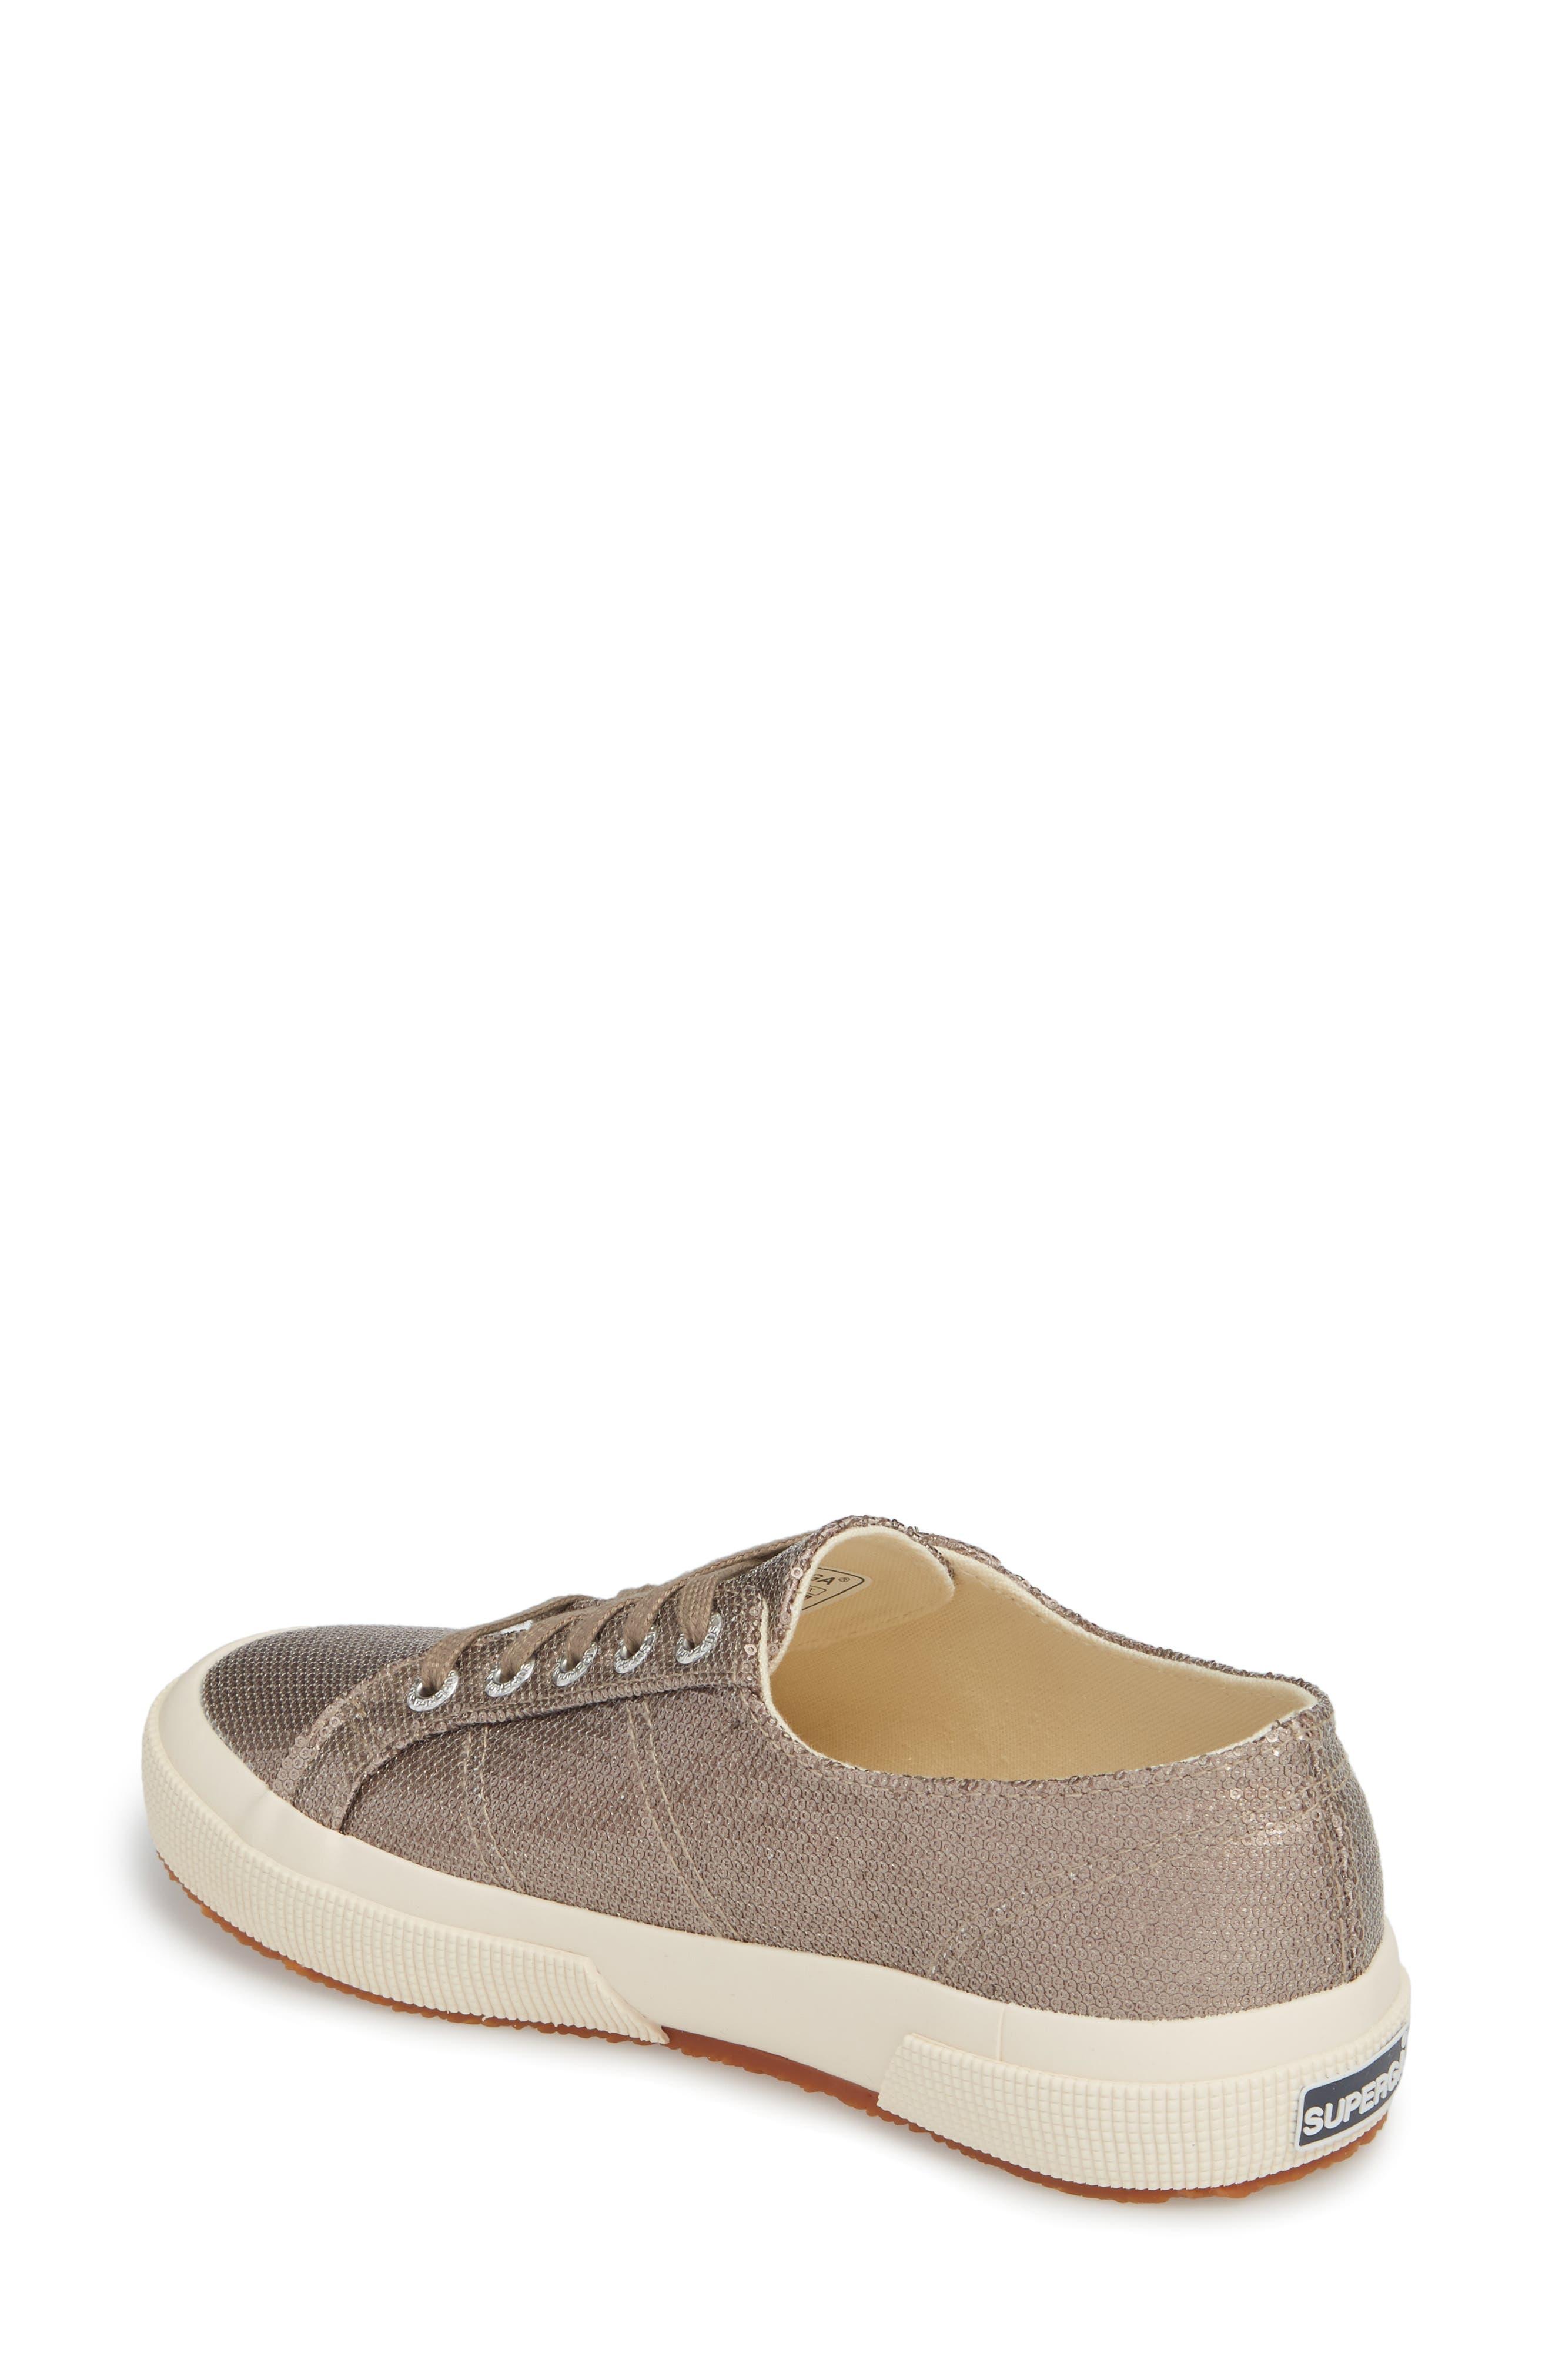 2750 Micro Sequin Sneaker,                             Alternate thumbnail 2, color,                             227